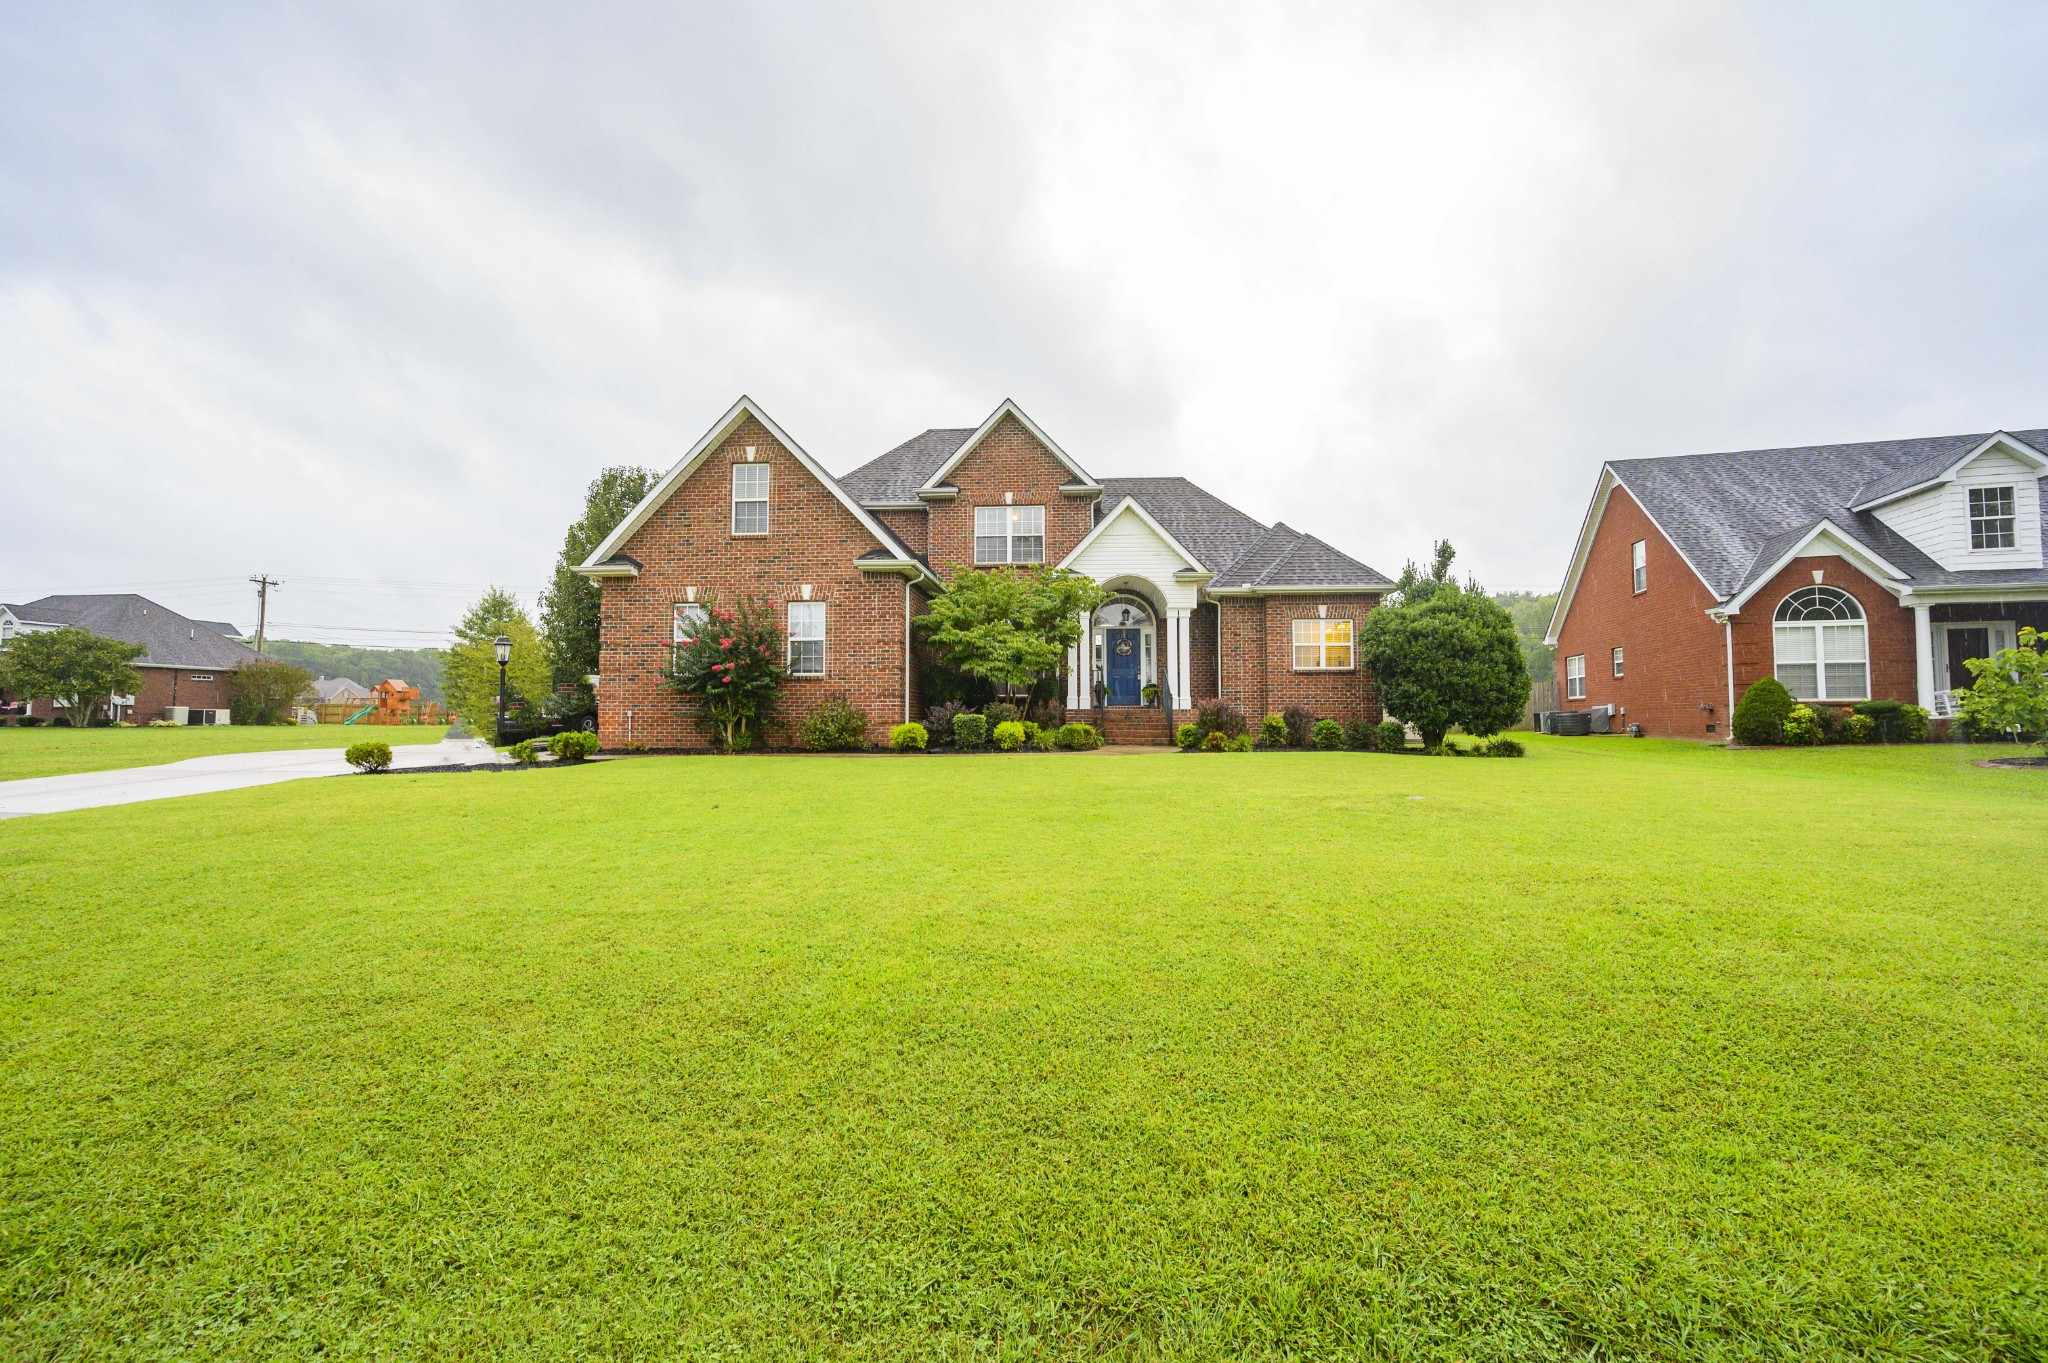 1013 John Hood Dr Property Photo - Rockvale, TN real estate listing